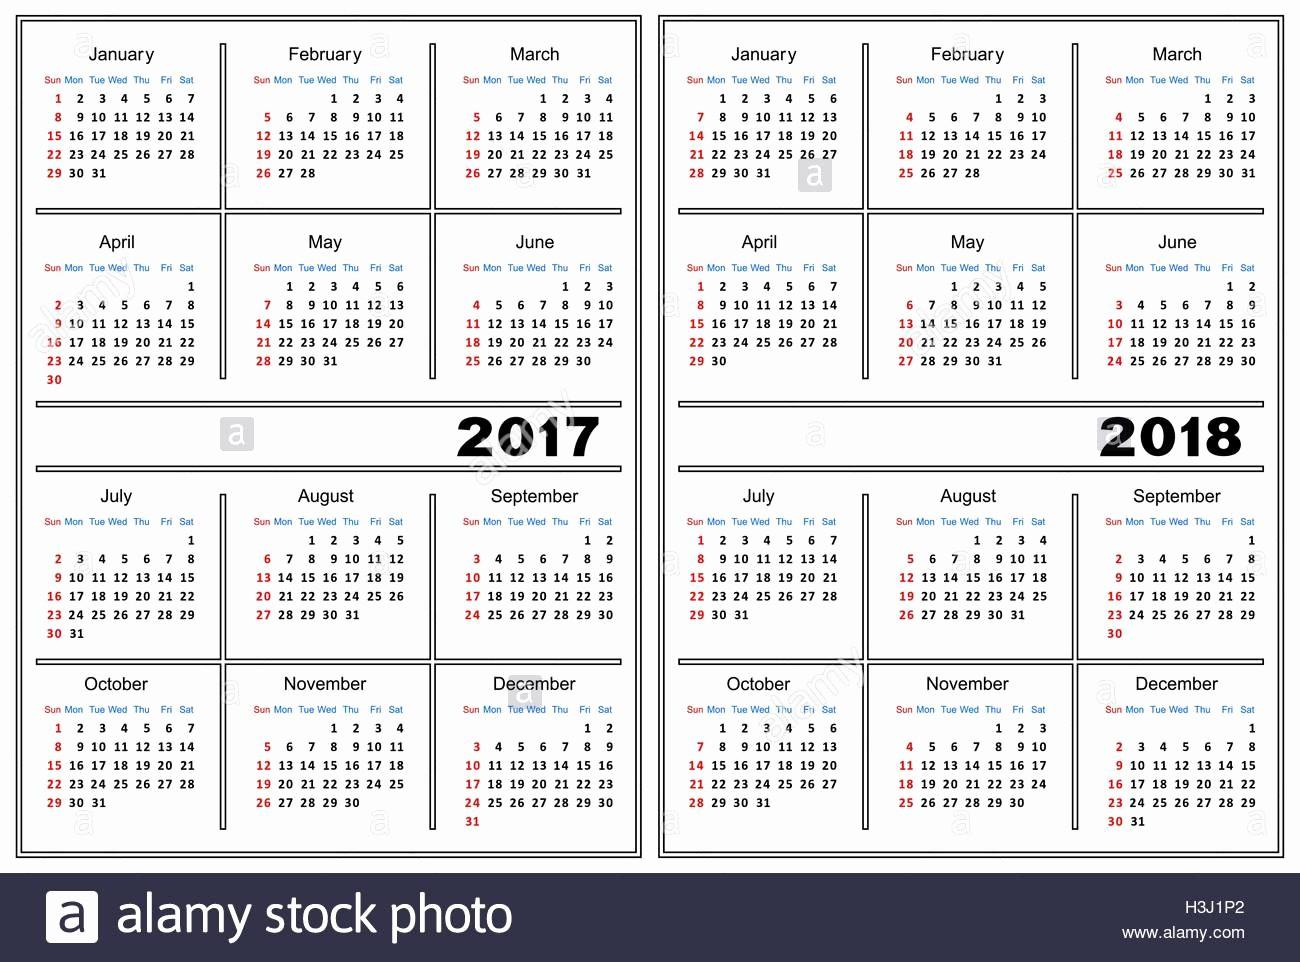 2017-2018 Printable Calendar New Calendar Template 2017 2018 Stock Vector Art